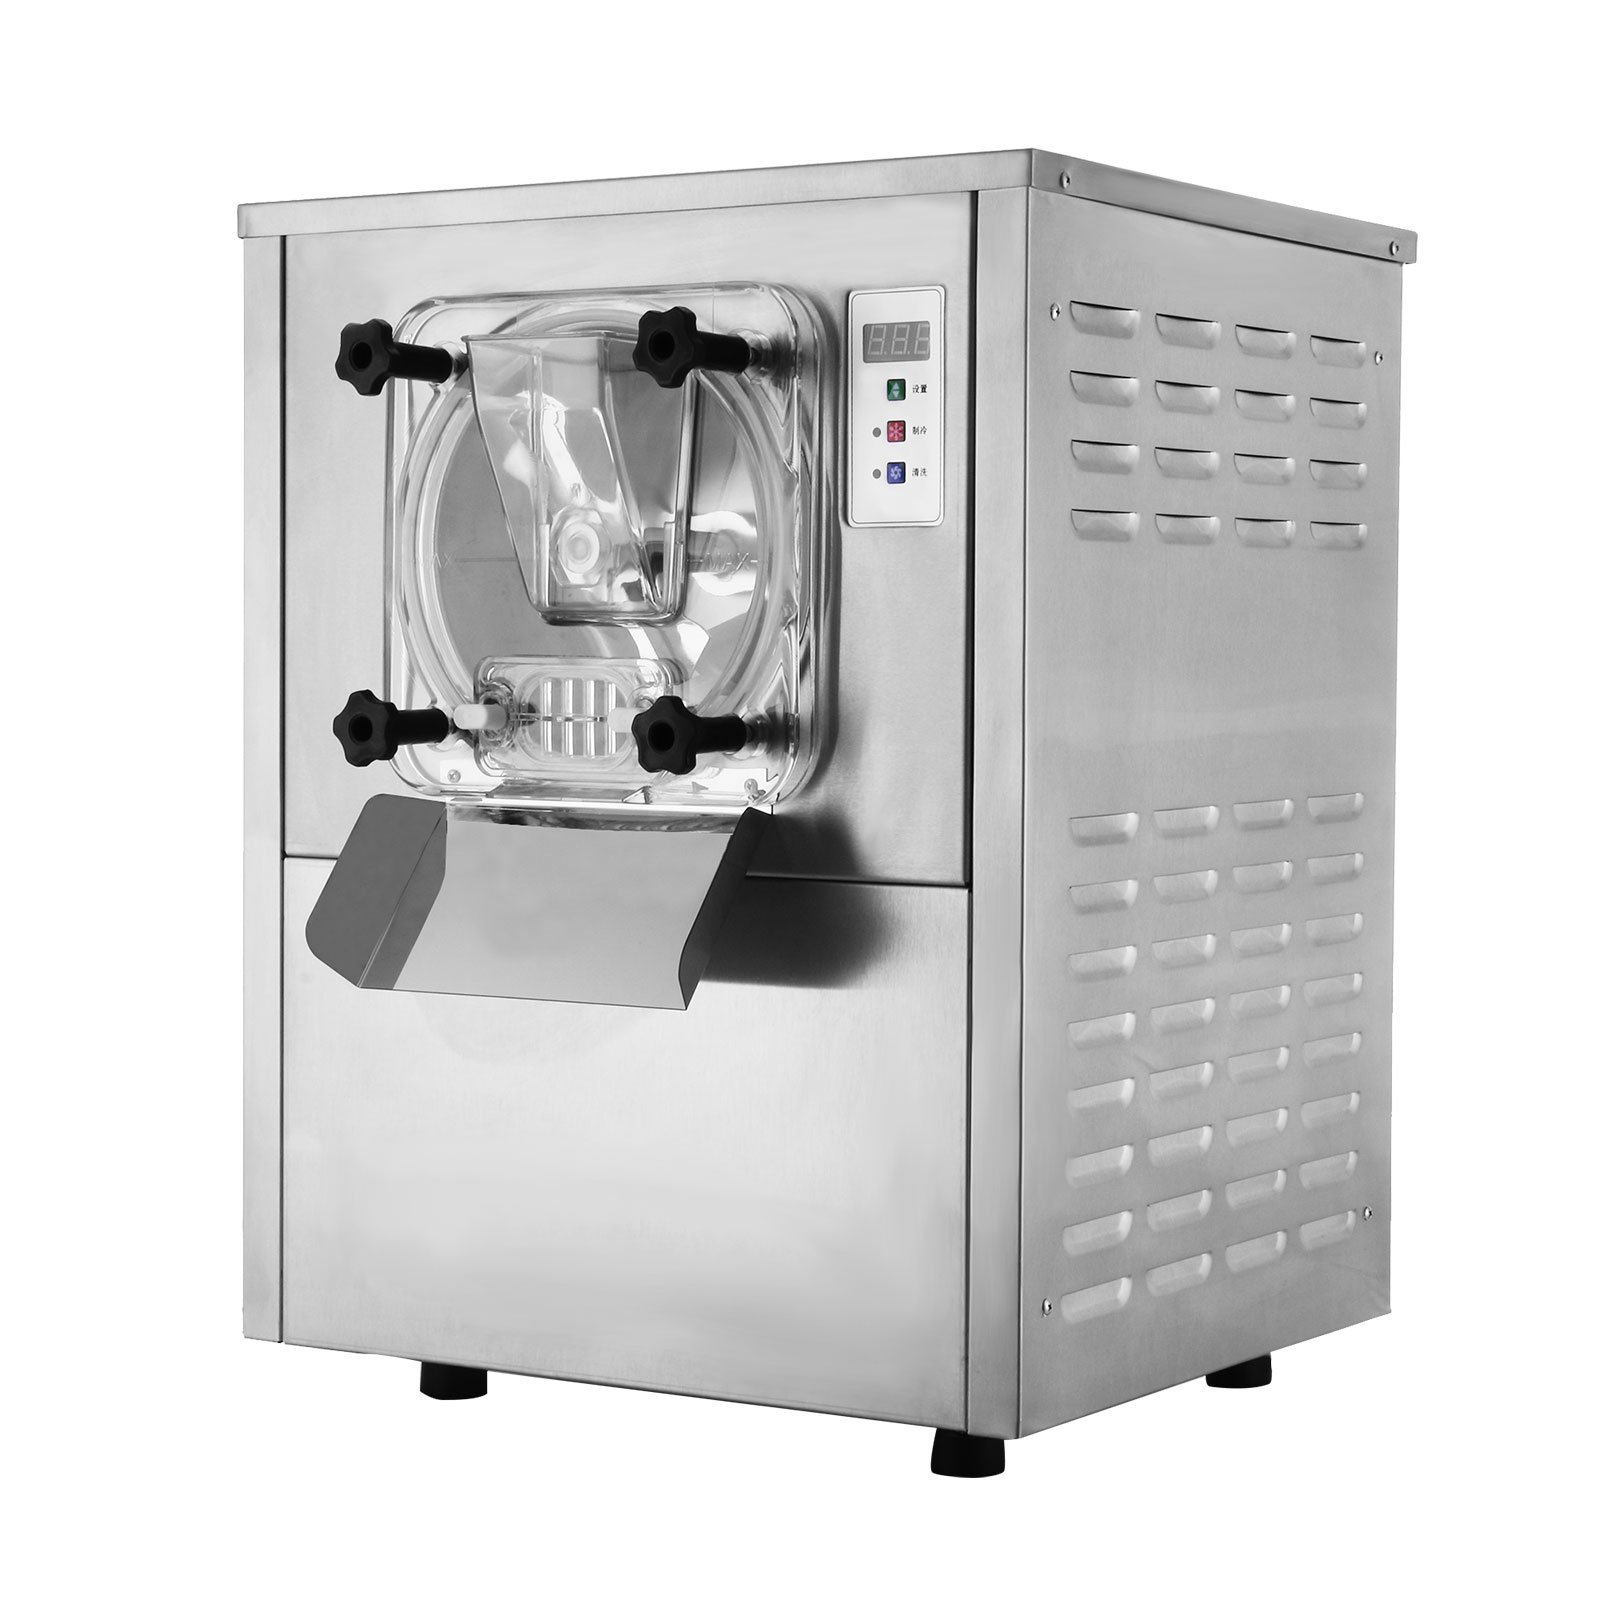 Simplego Commercial Ice Cream Maker 5.2 Gallon/H Hard Ice Cream Machine 1400W Digital Display Stainless Steel Ice Cream Maker Machine